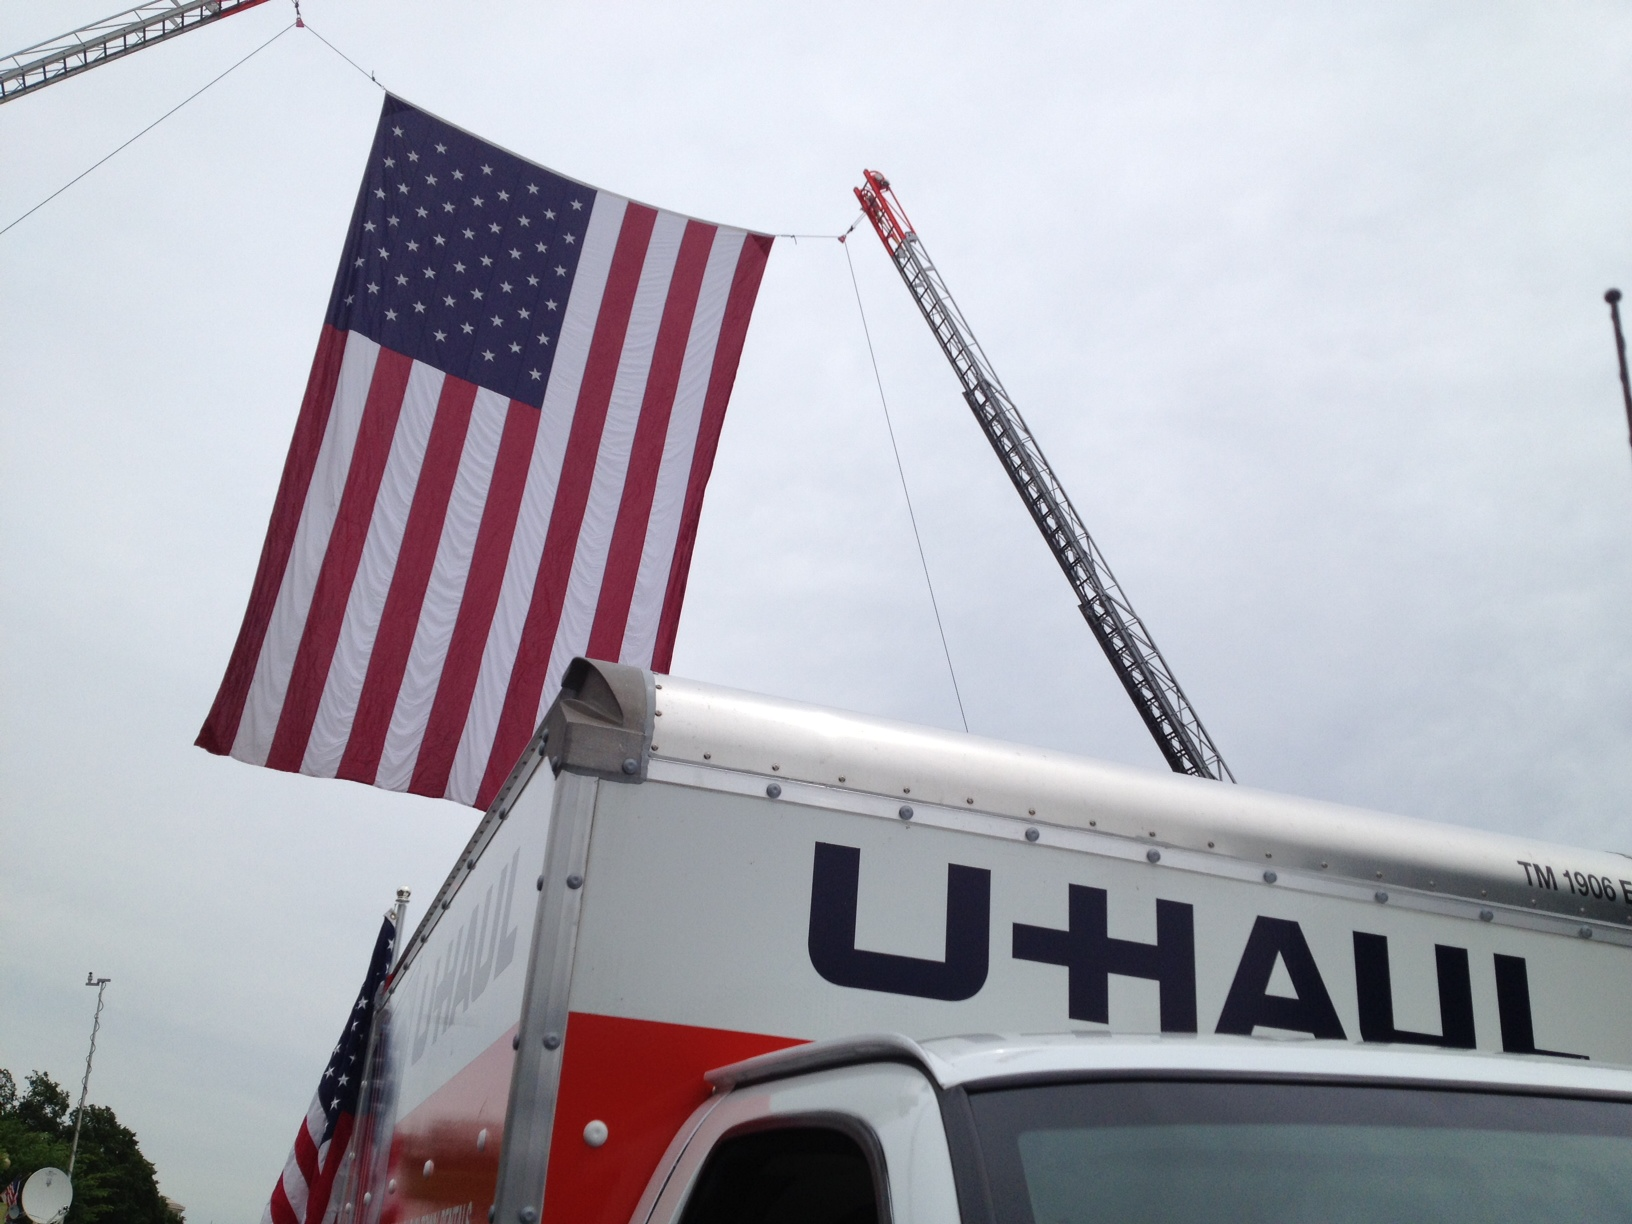 Memorial Day Parade In Washington Dc U Haul Blog